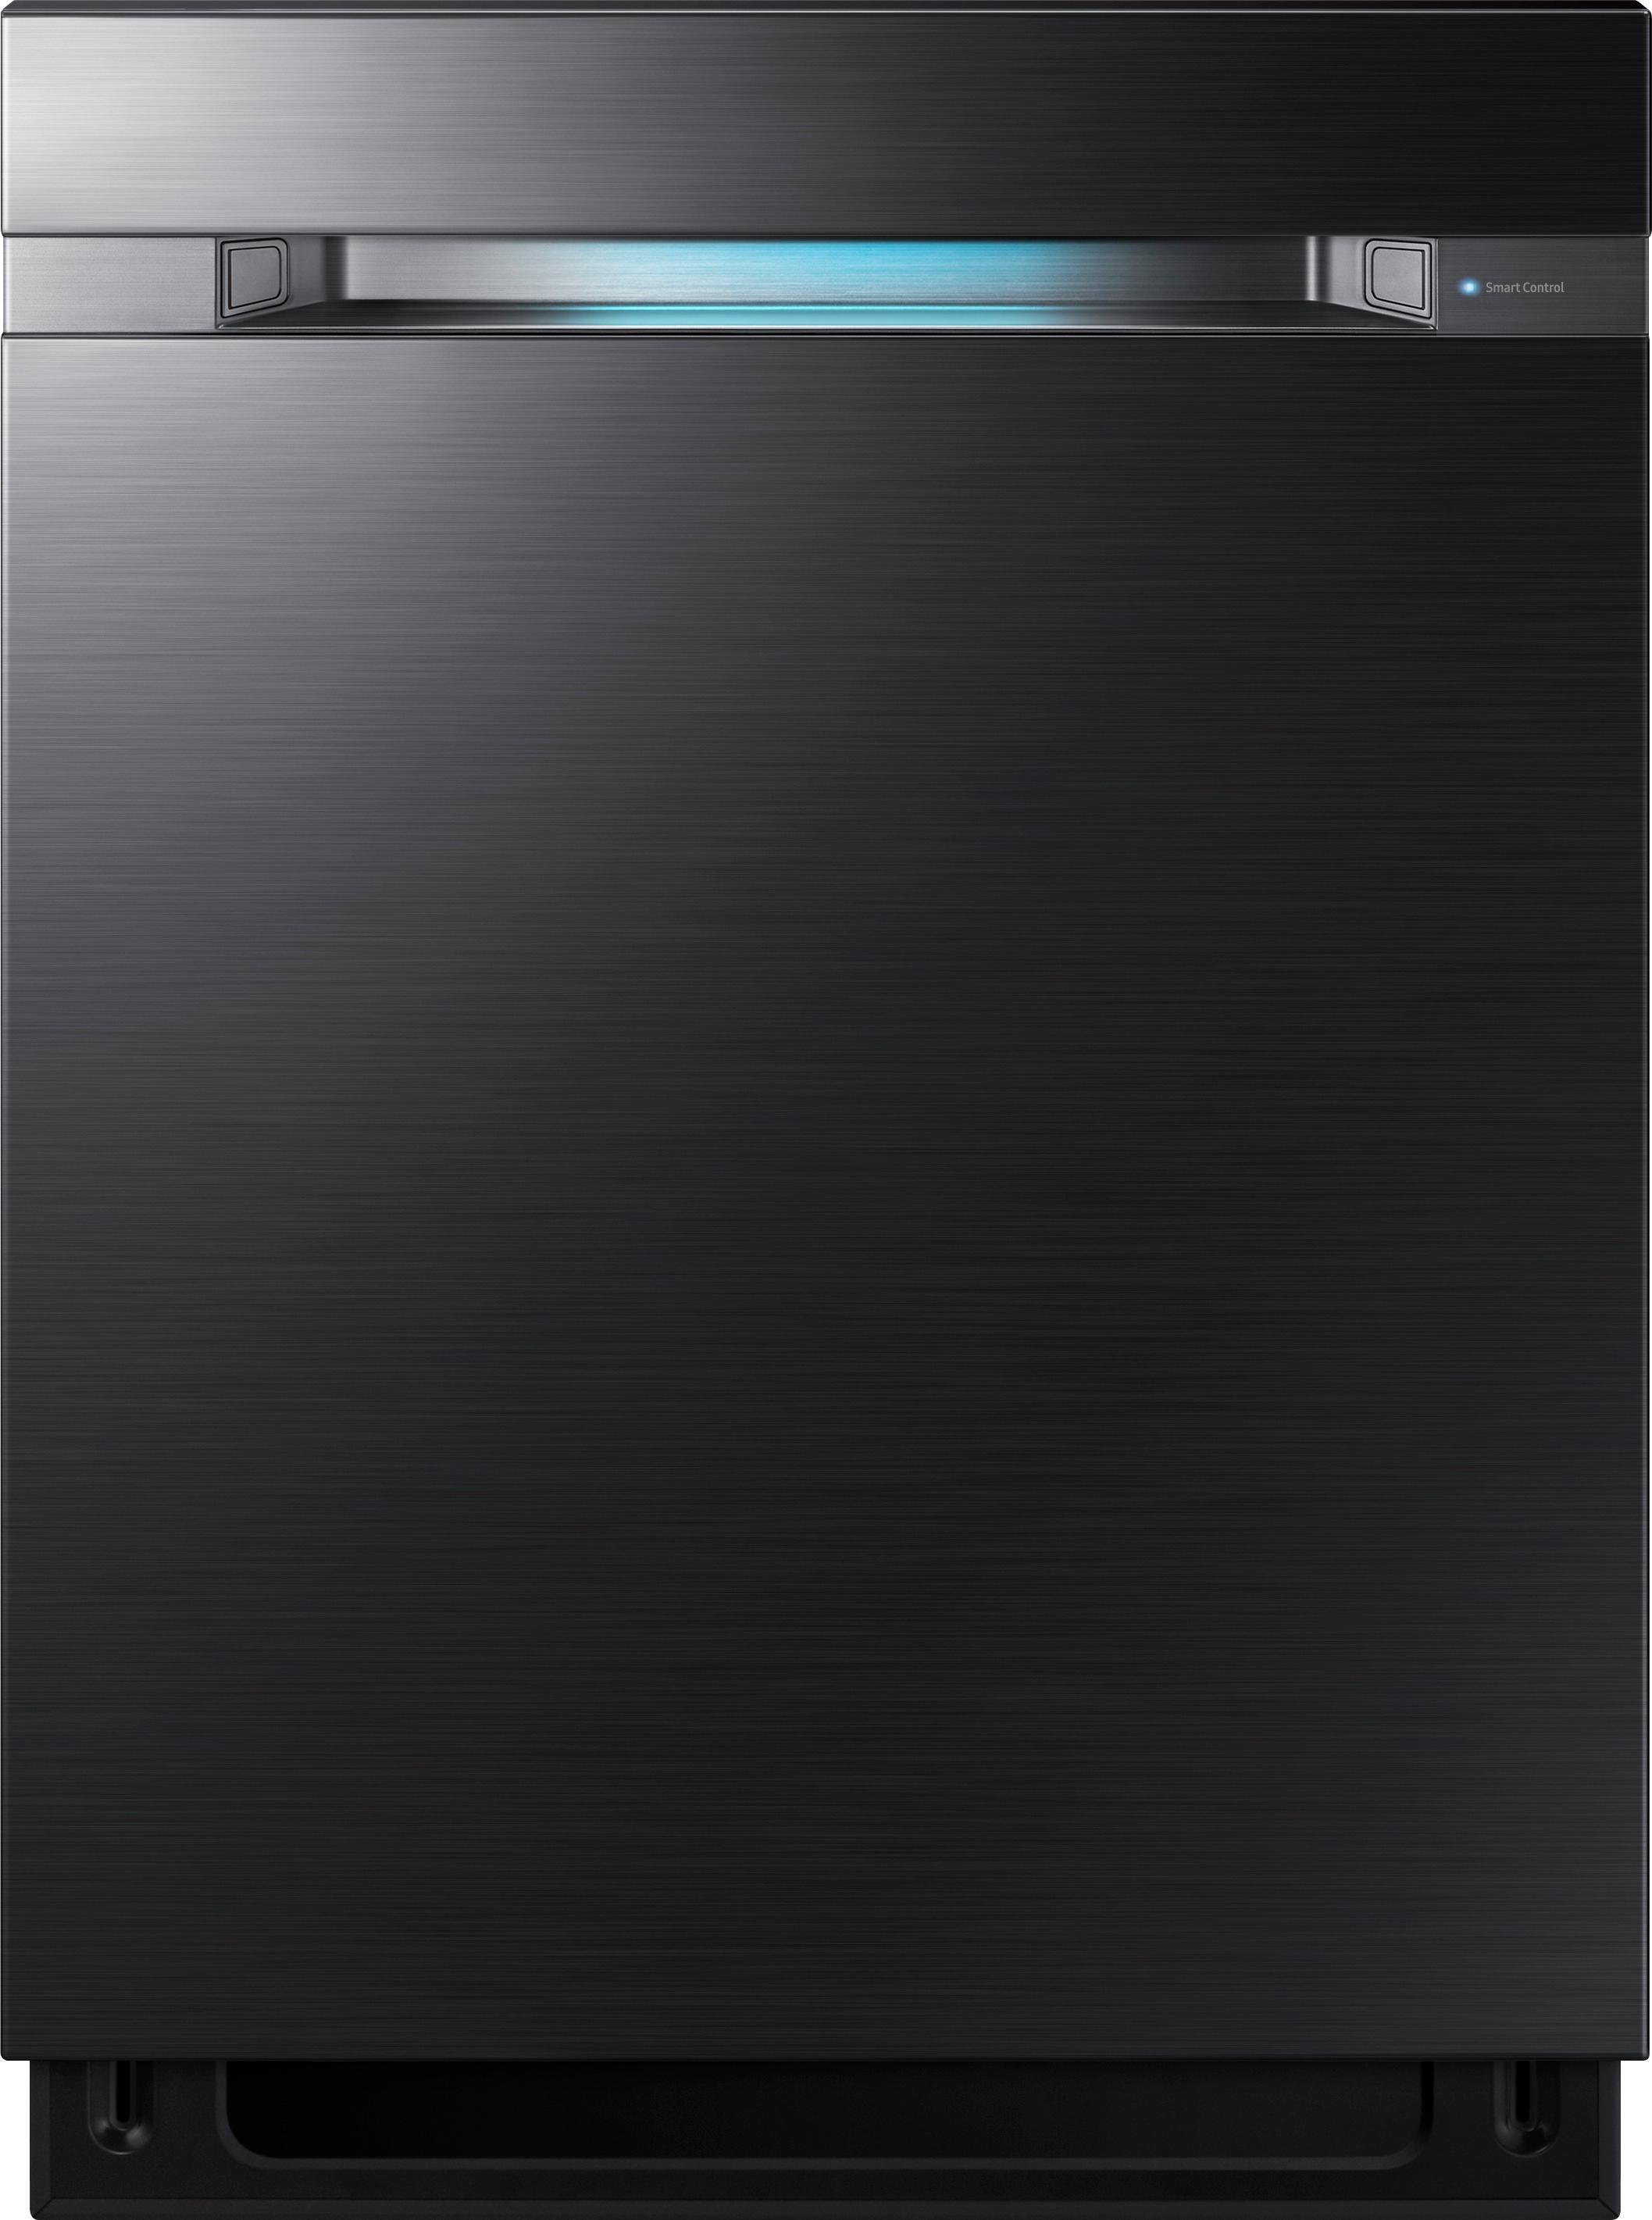 Samsung DW80M9960UG